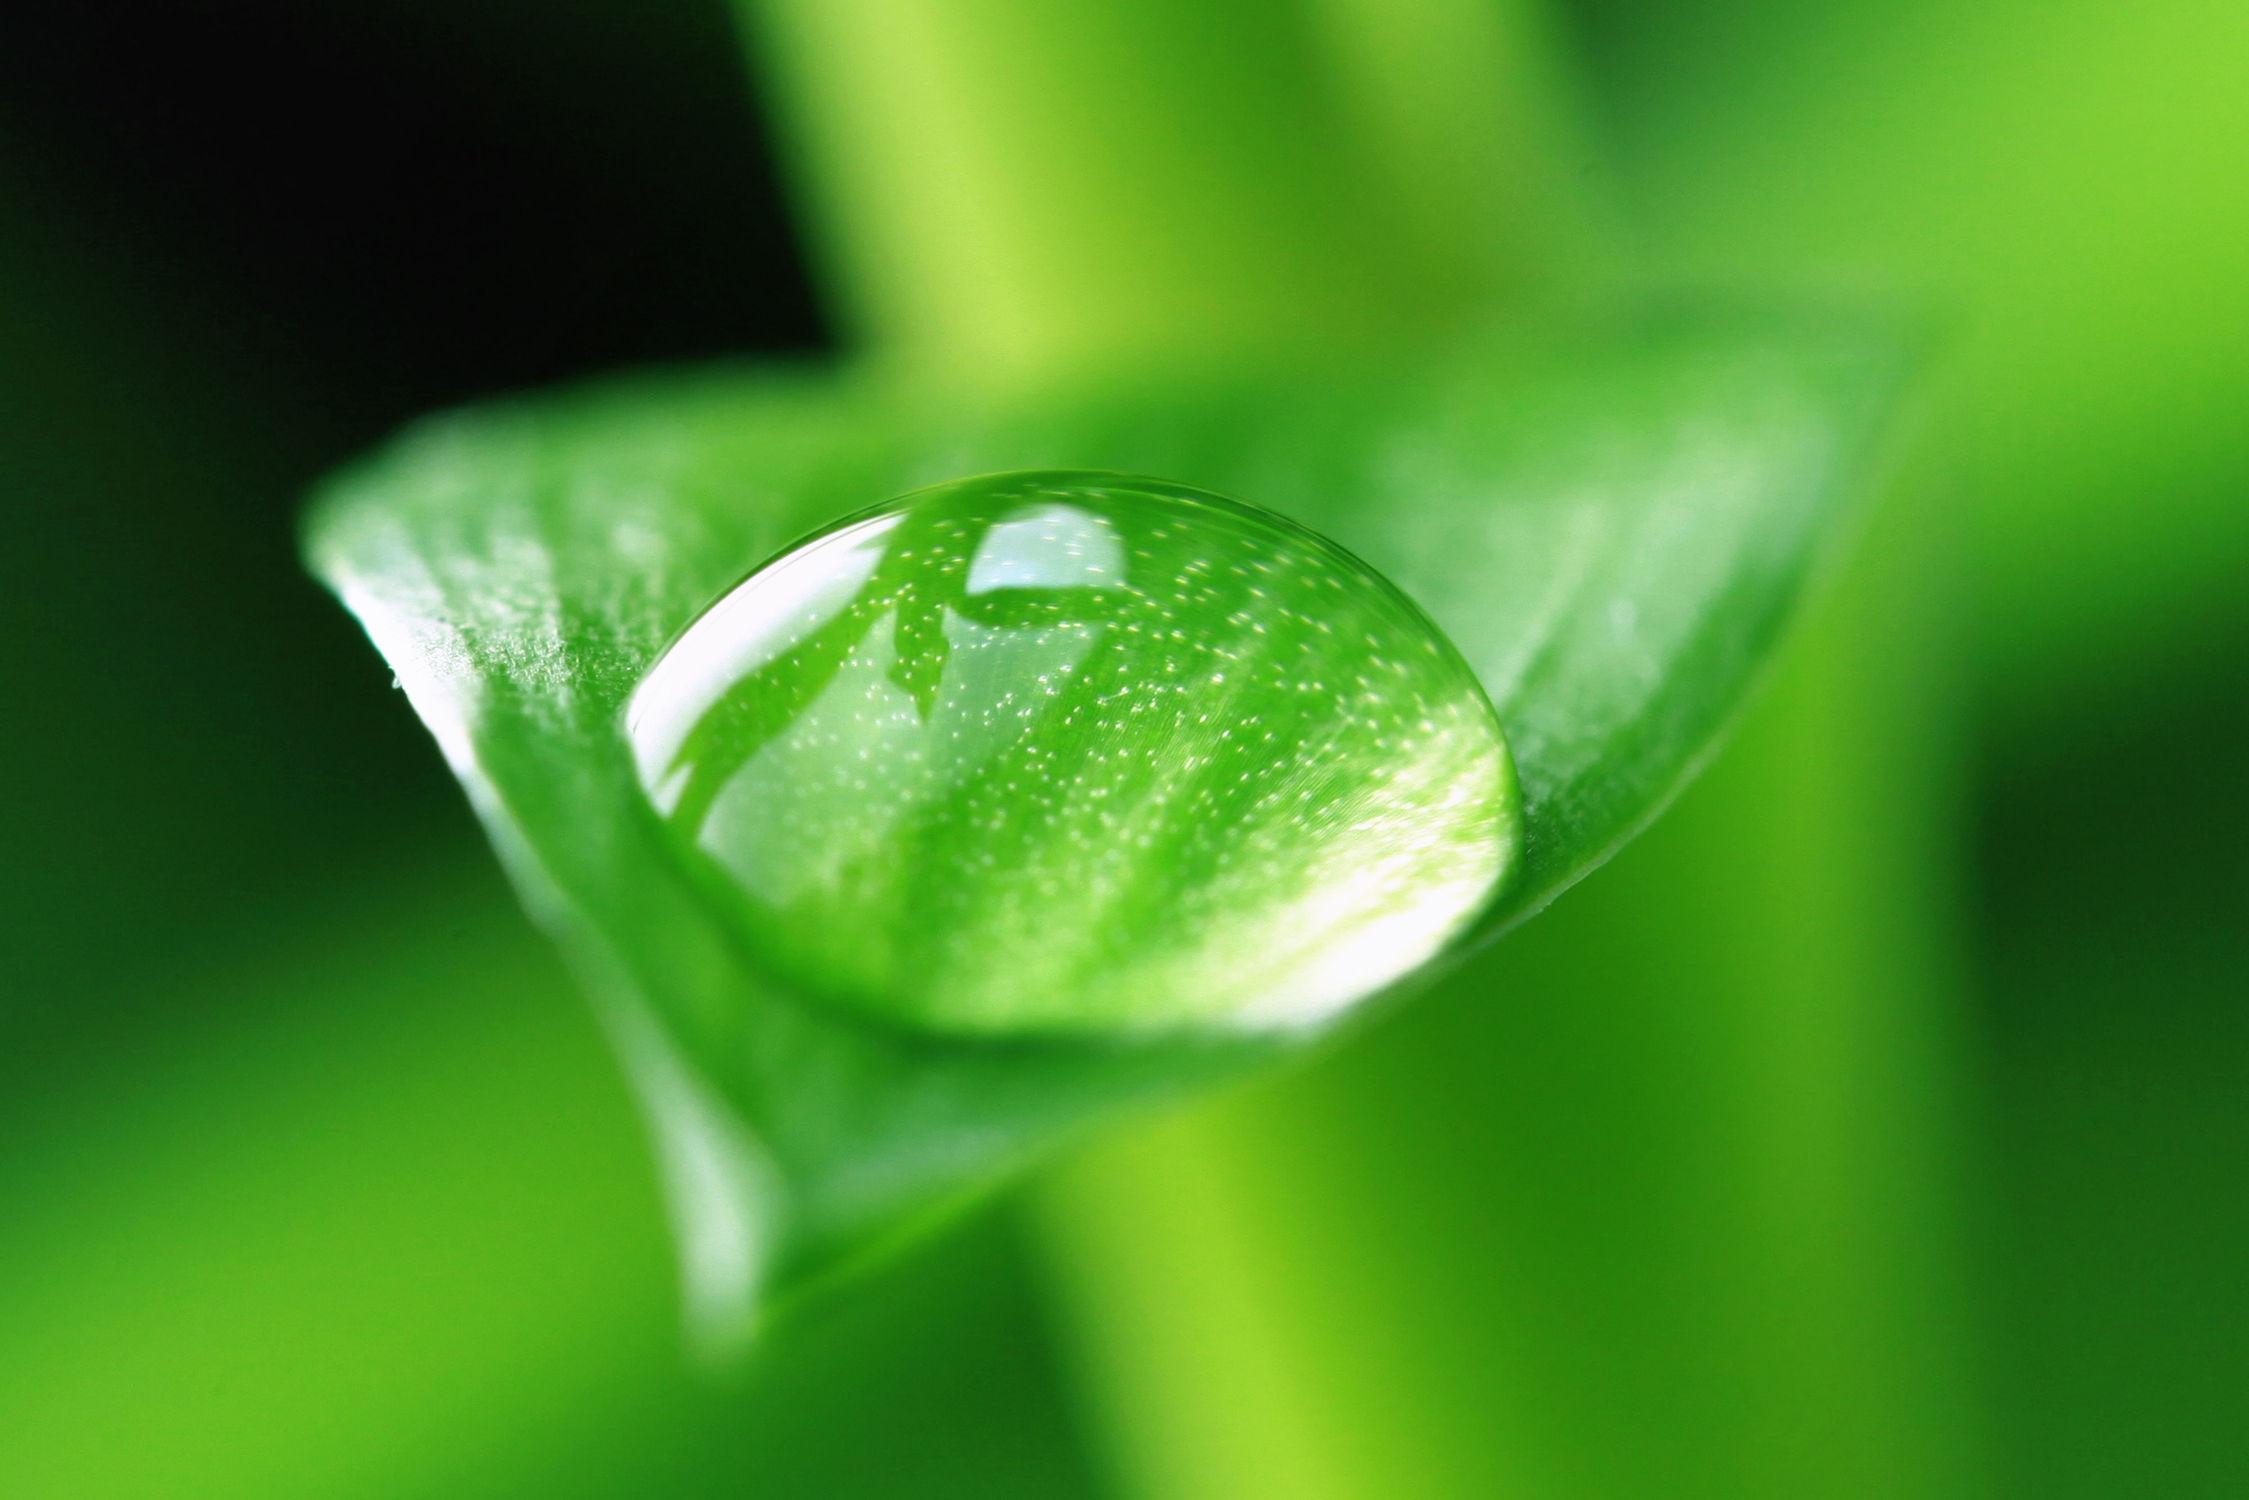 Bild mit Natur, Bambus, Blätter, Blatt, Wassertropfen, Regentropfen, Tropfen, Bambusblatt, Bambusblätter